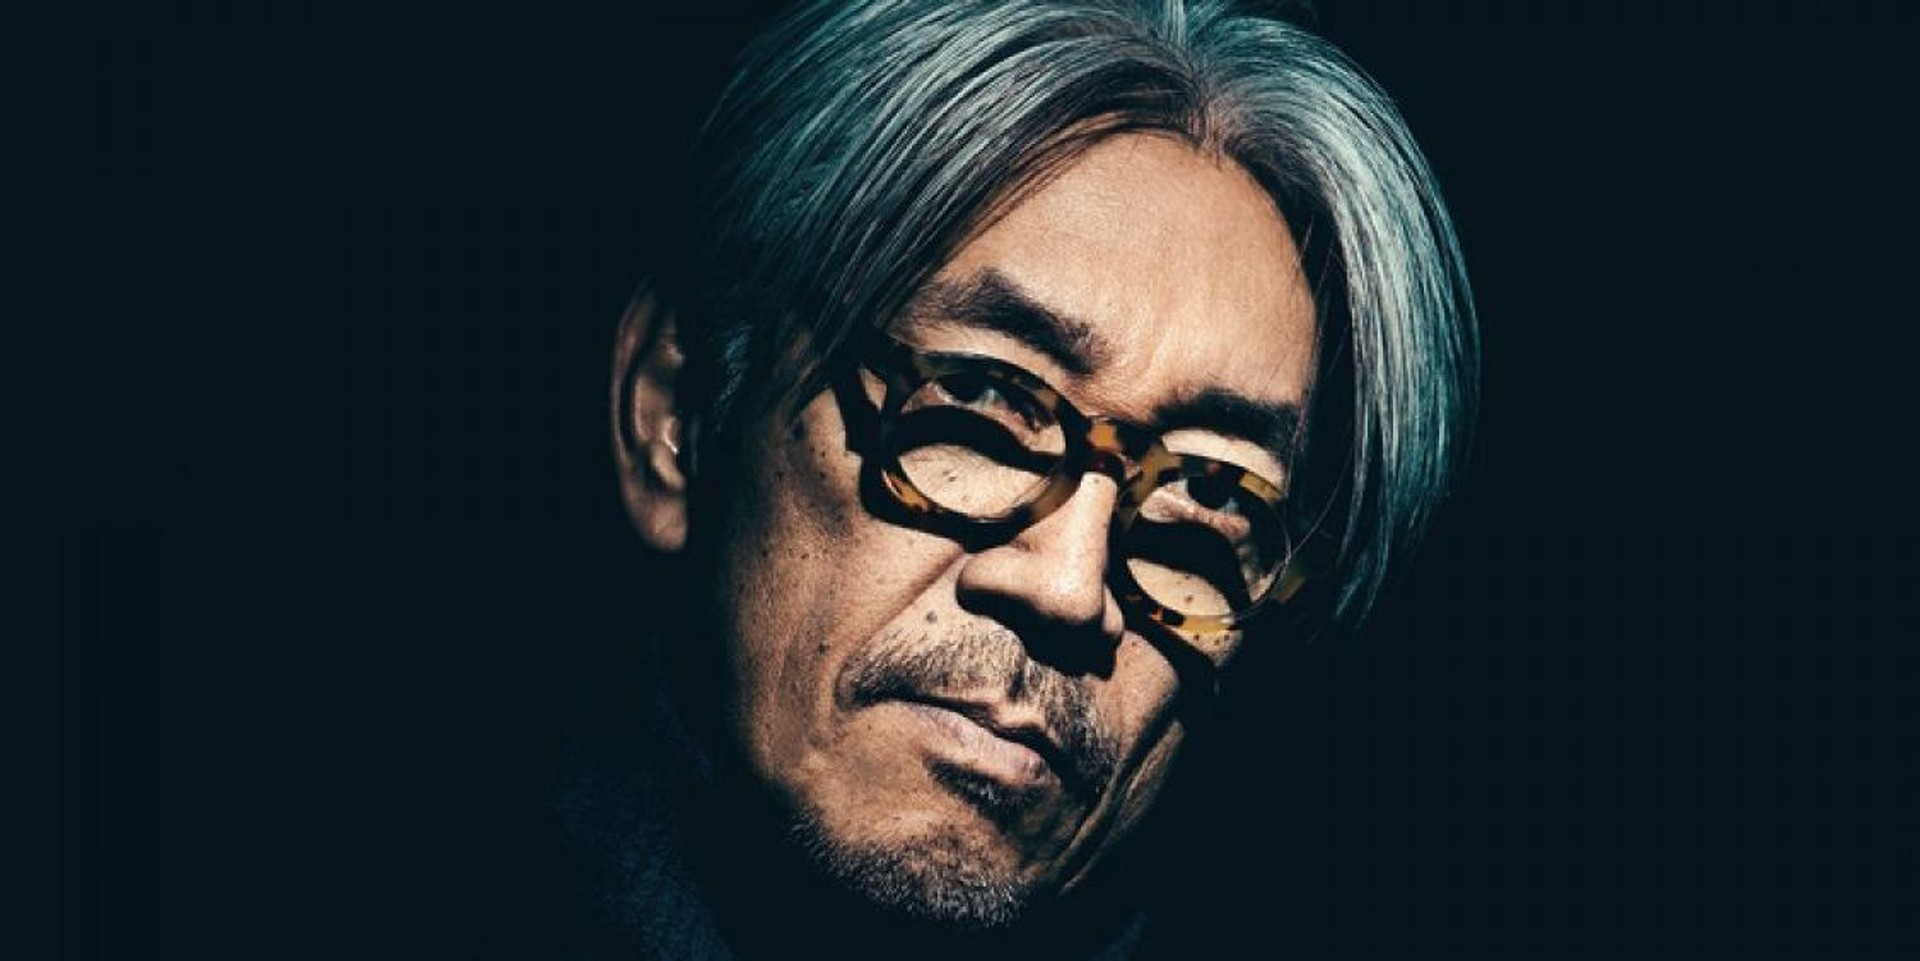 BREAKING: Ryuichi Sakamoto to perform in Singapore this May